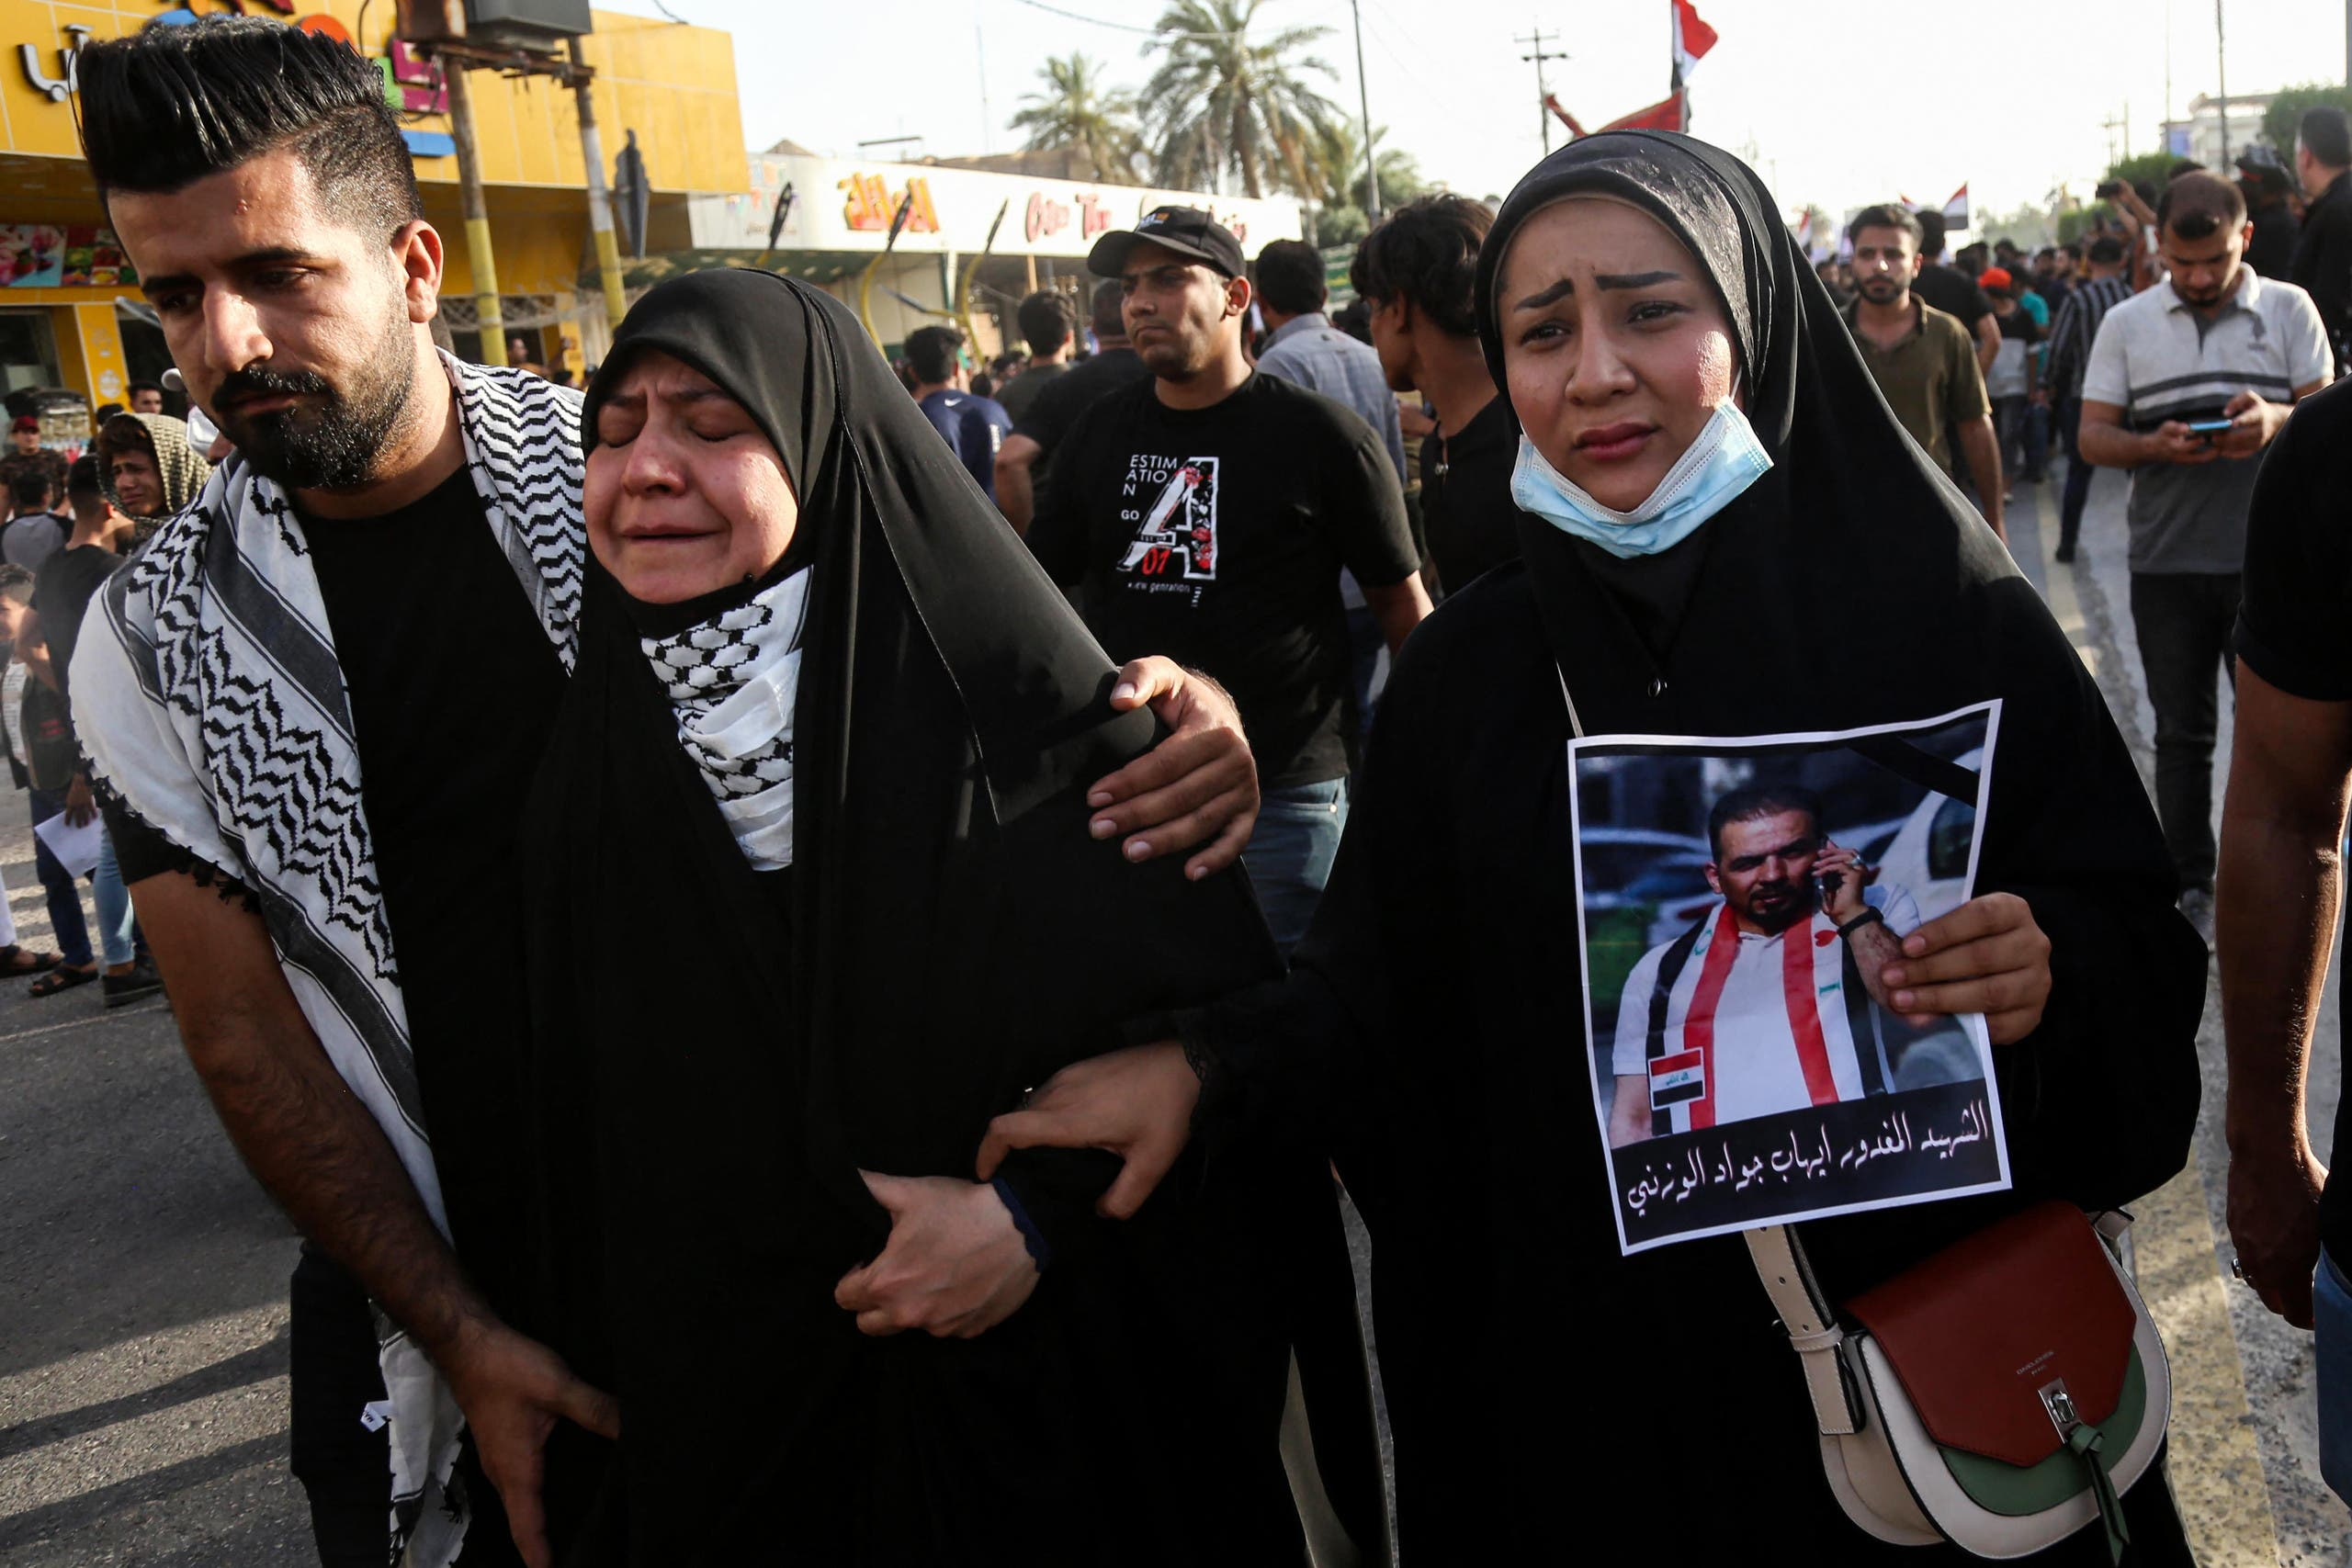 Ihab al-Wazni's brother: Qassem Musleh's release is illegal